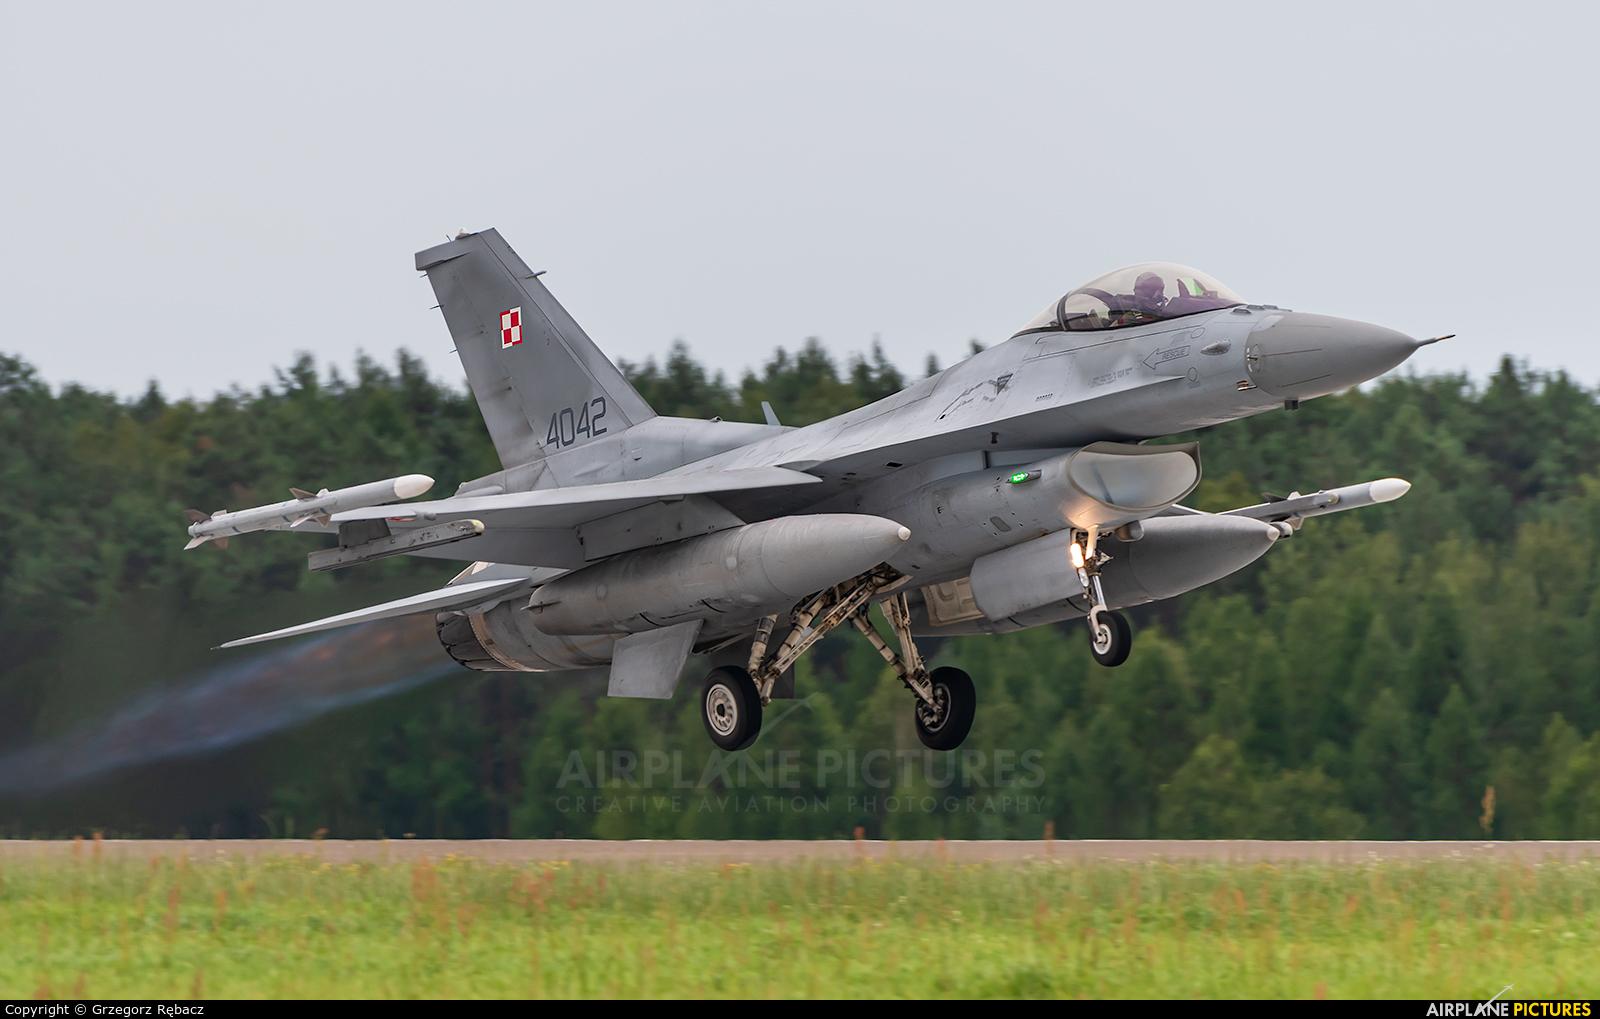 Poland - Air Force 4042 aircraft at Łask AB